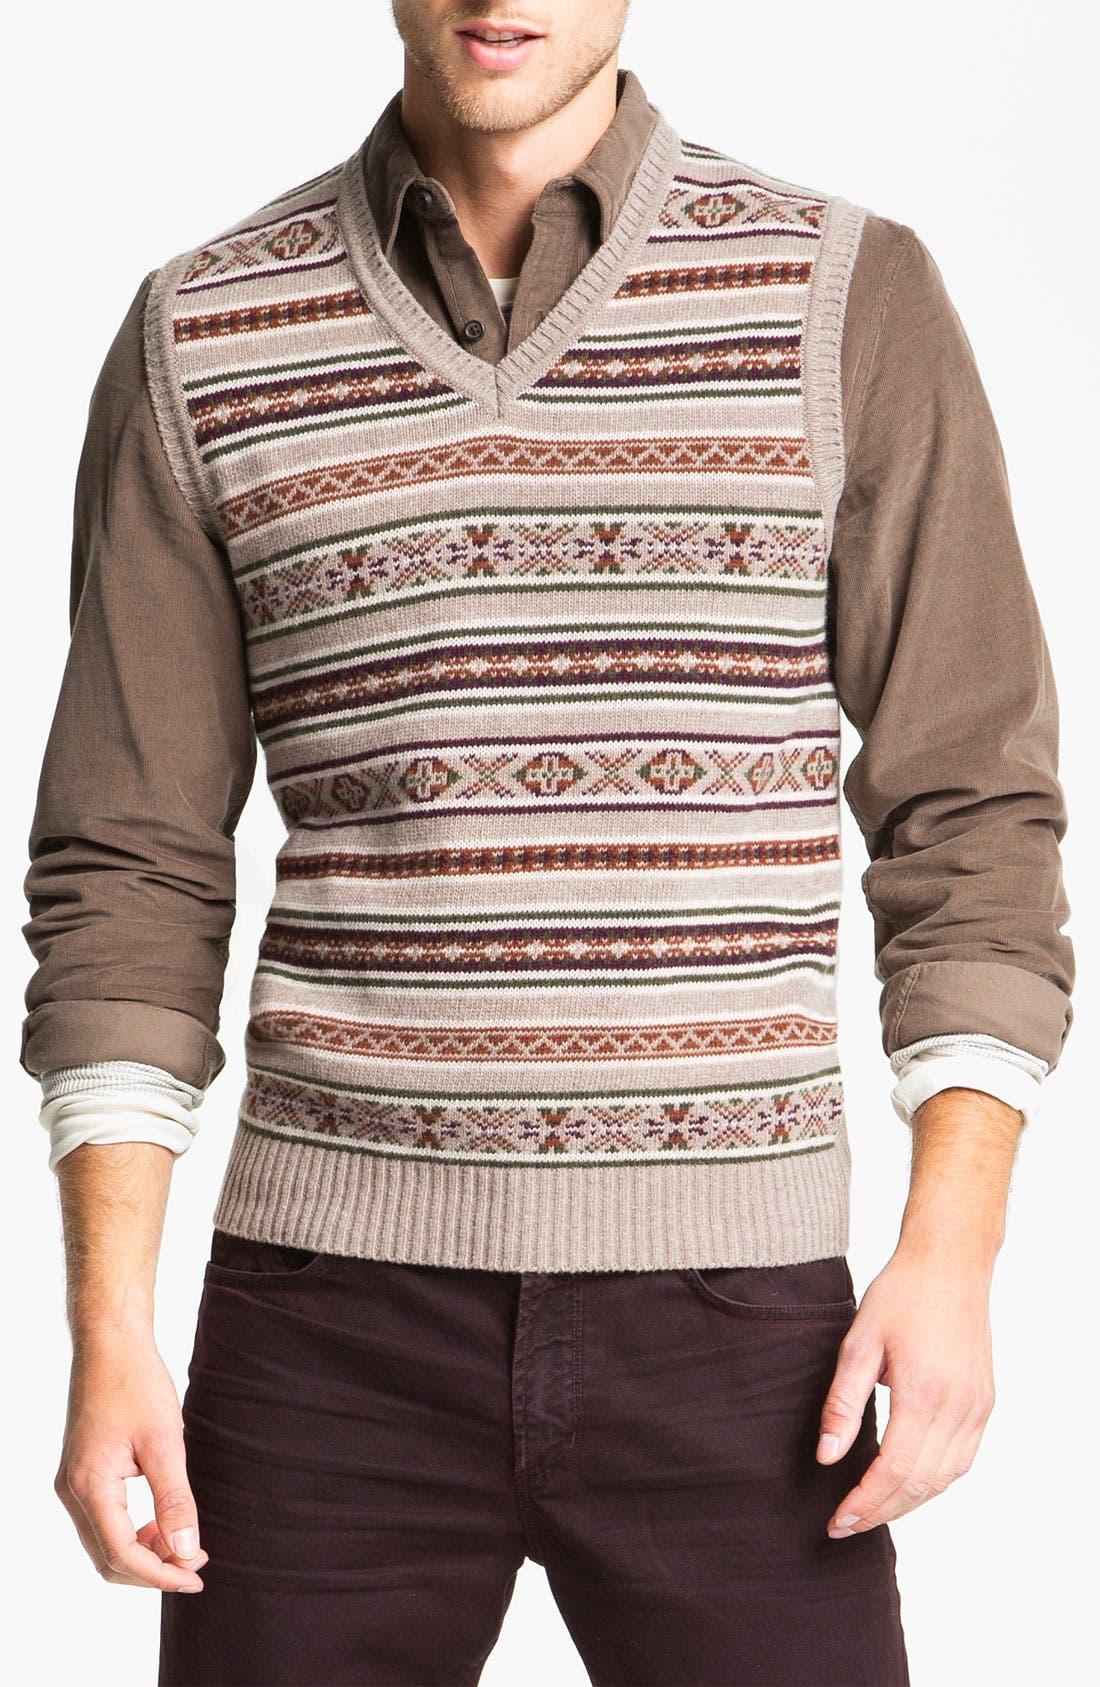 Main Image - Fiesole V-Neck Wool Blend Sweater Vest